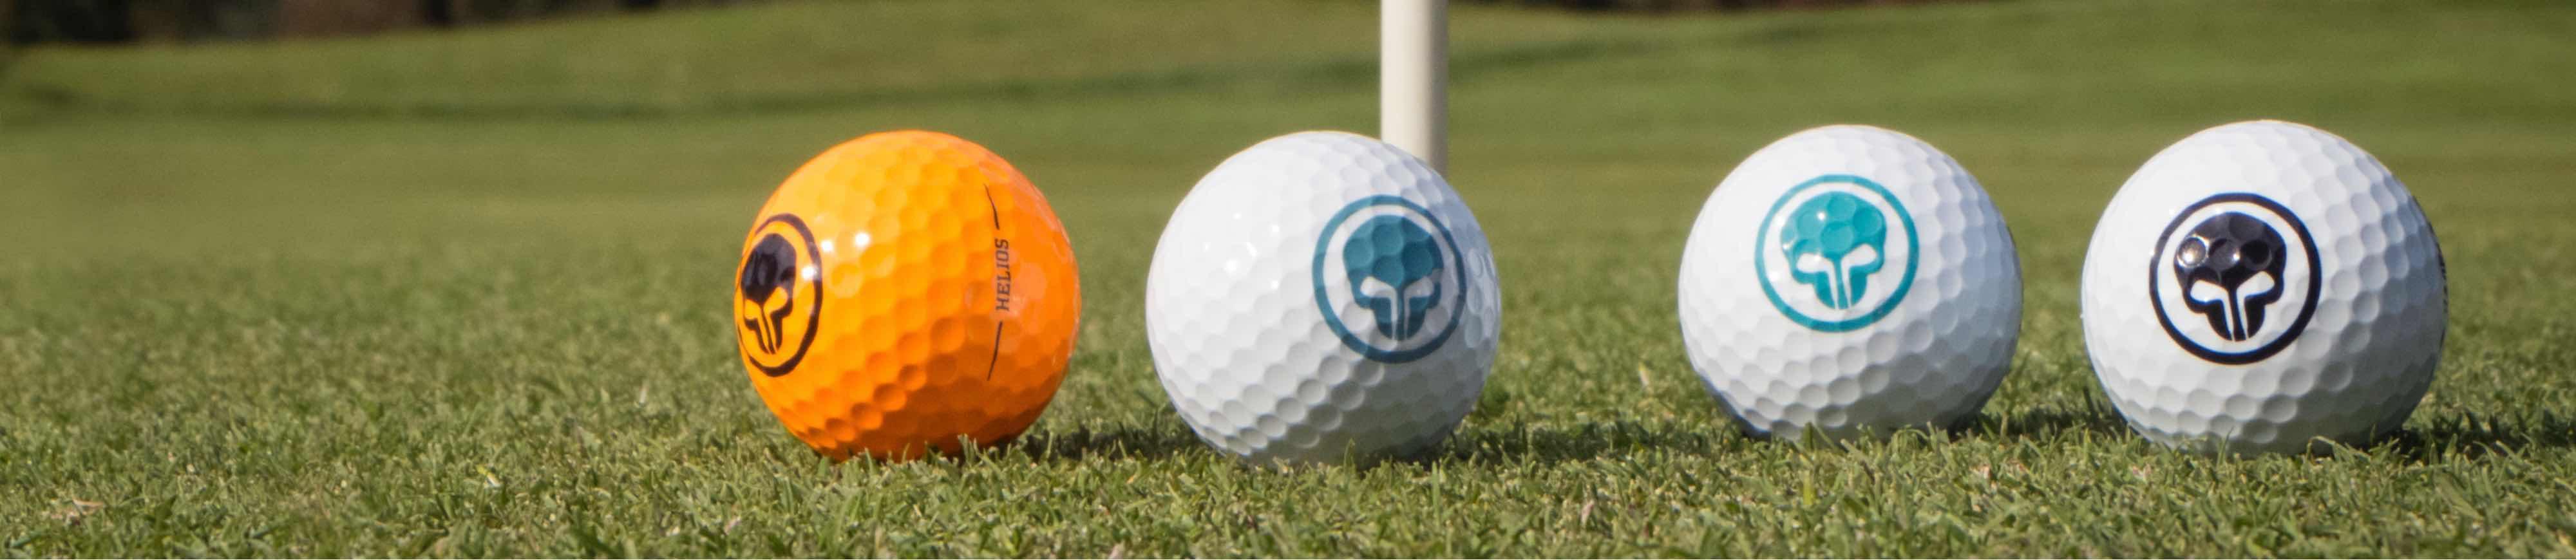 Golfb-lle-auf-Golfplatz563a31219a53f